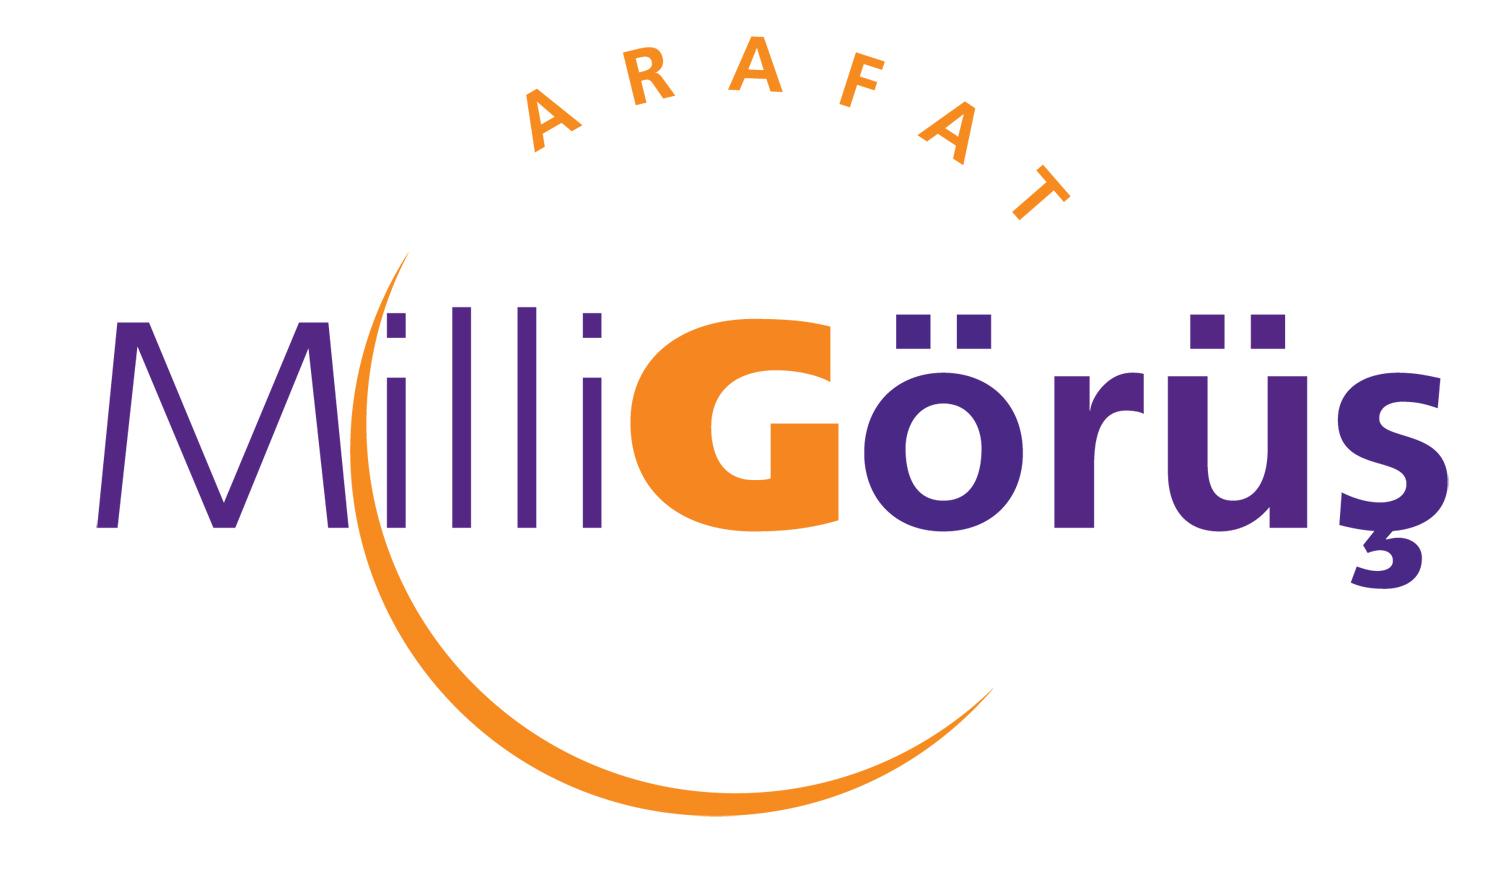 Stichting Milli Görüs Arafat